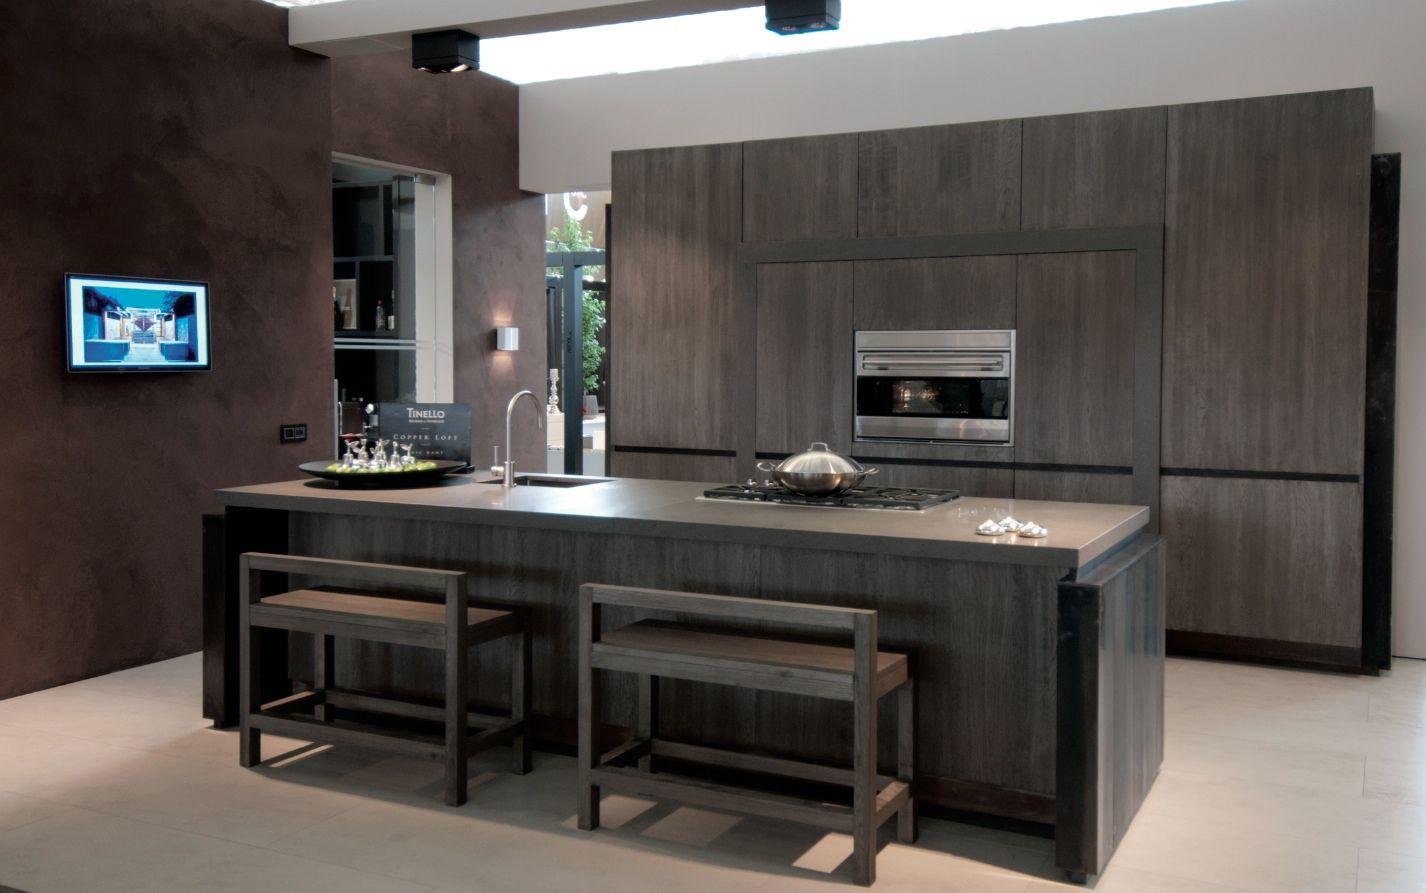 Minimalistische landelijke keuken van eric kant tinello keukens keukens kookeilanden - Bar design keuken ...